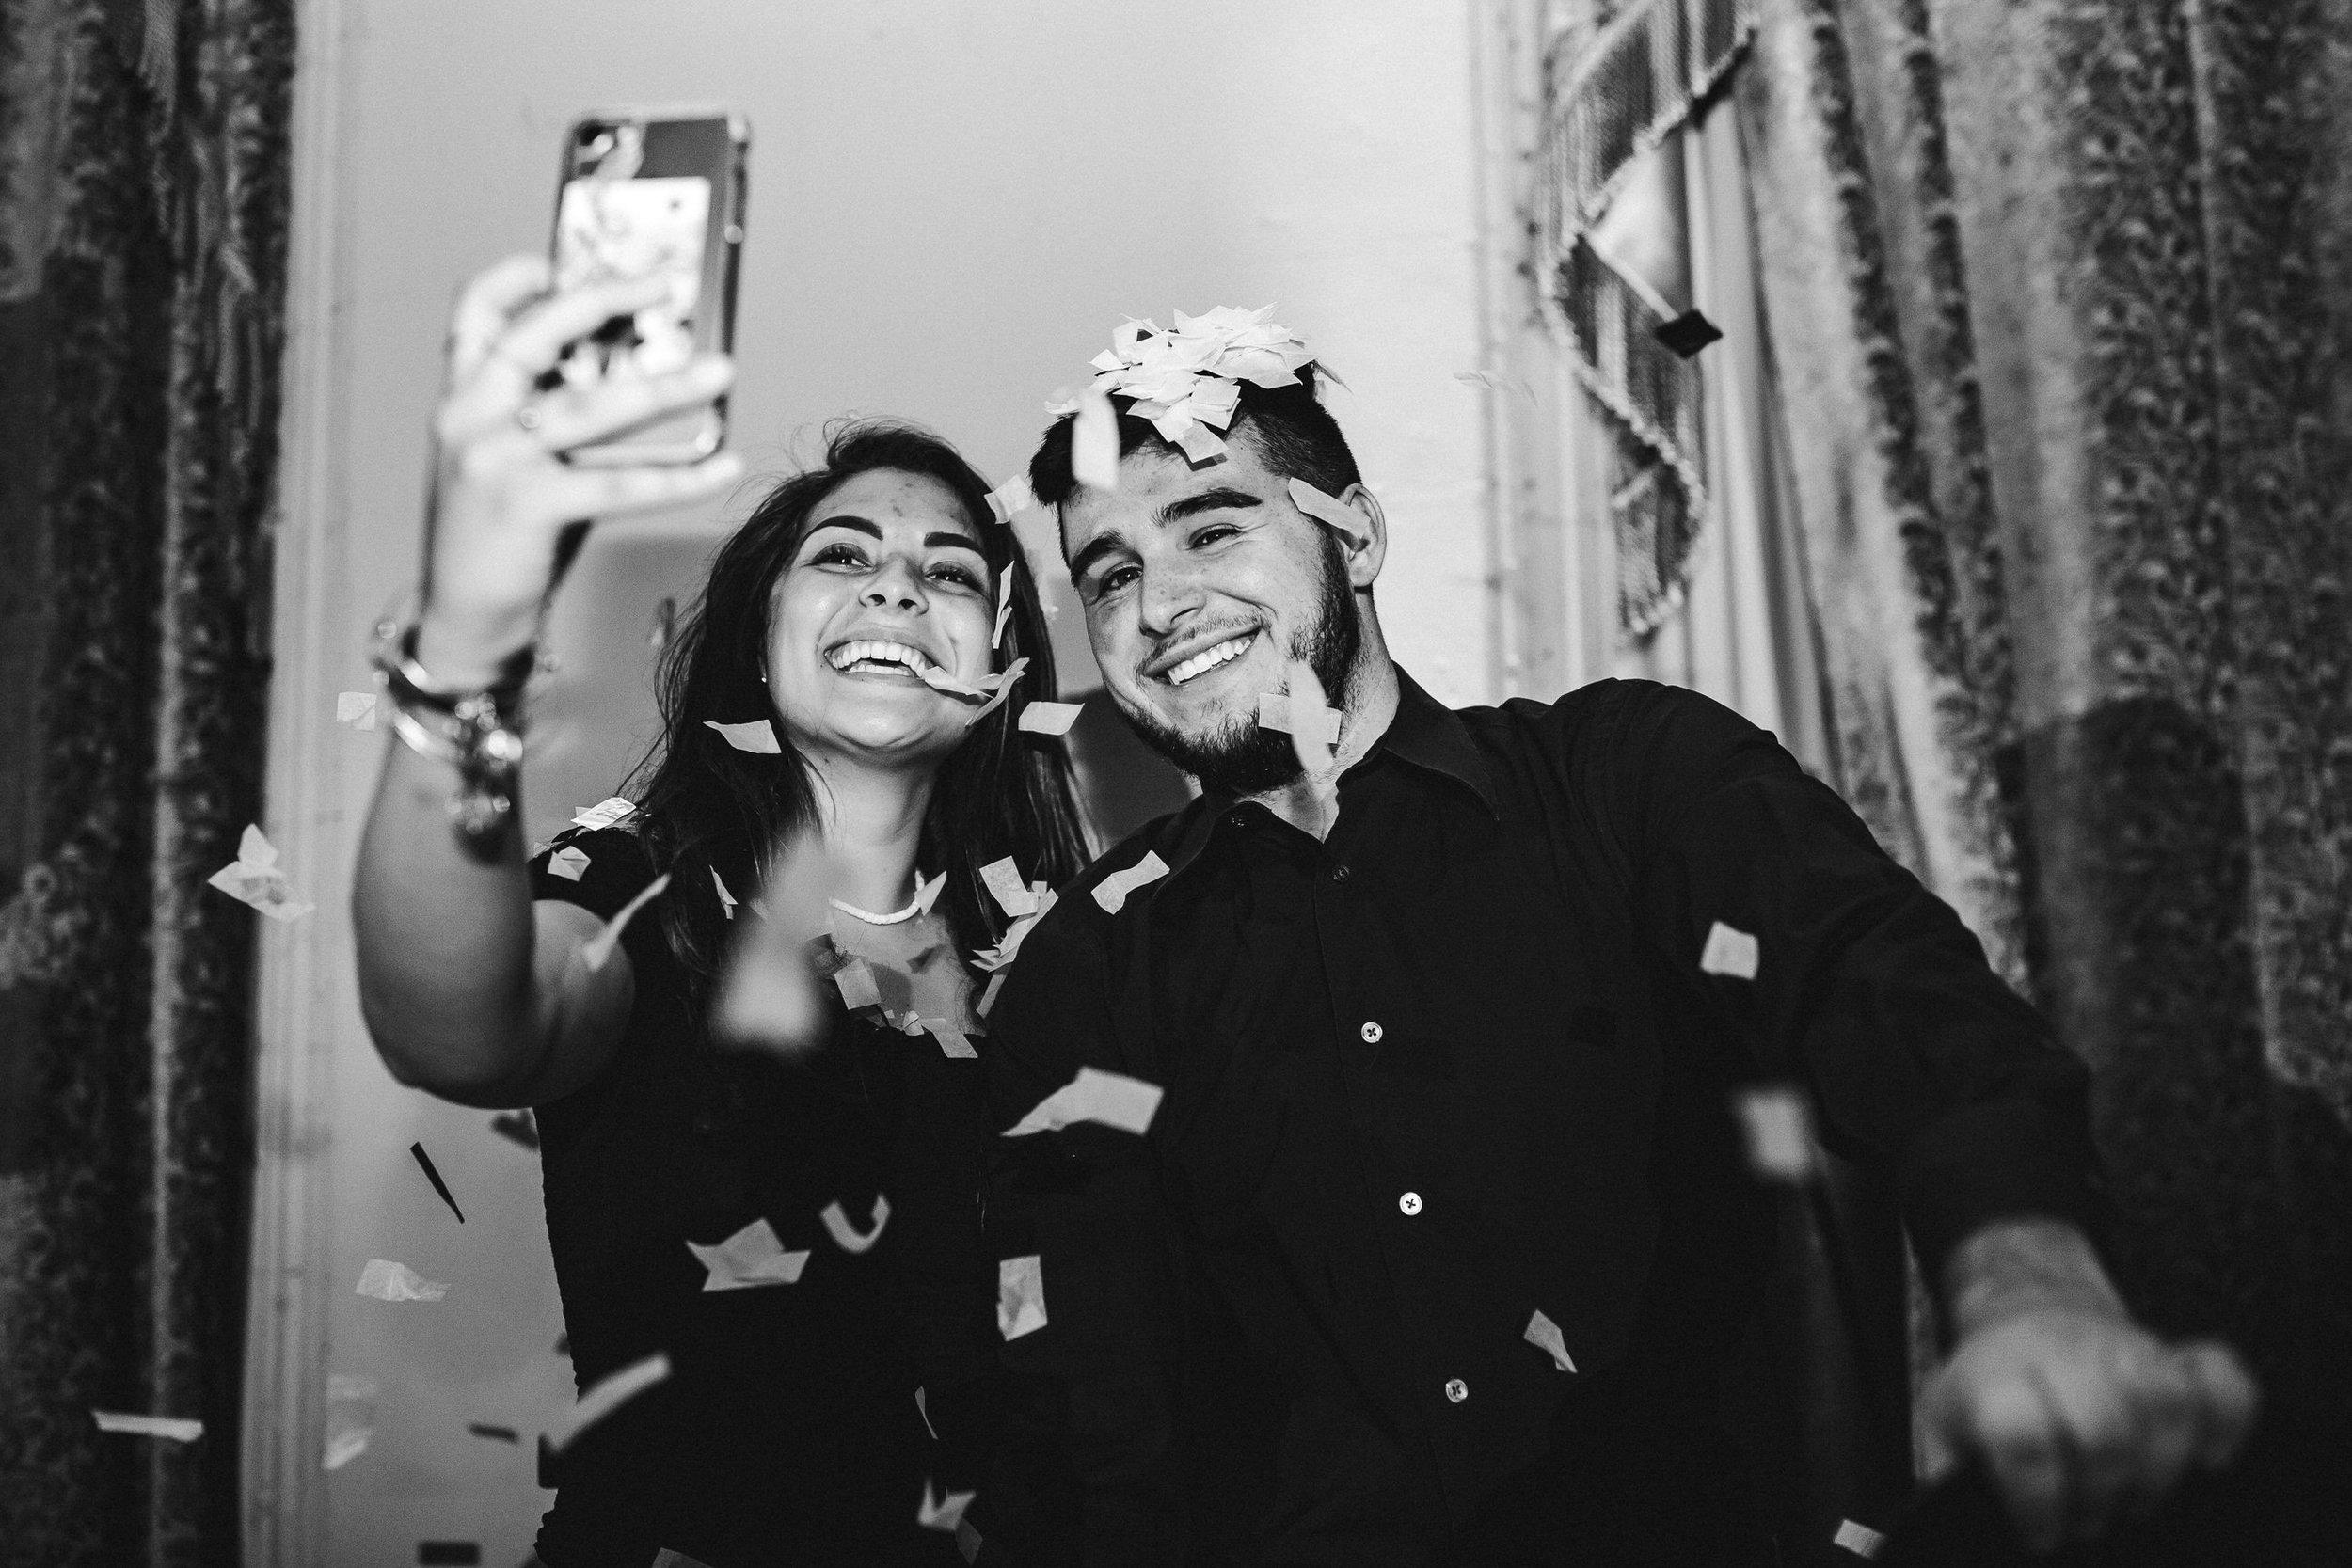 miami-biltmore-wedding-photographer-reception-party-9.jpg